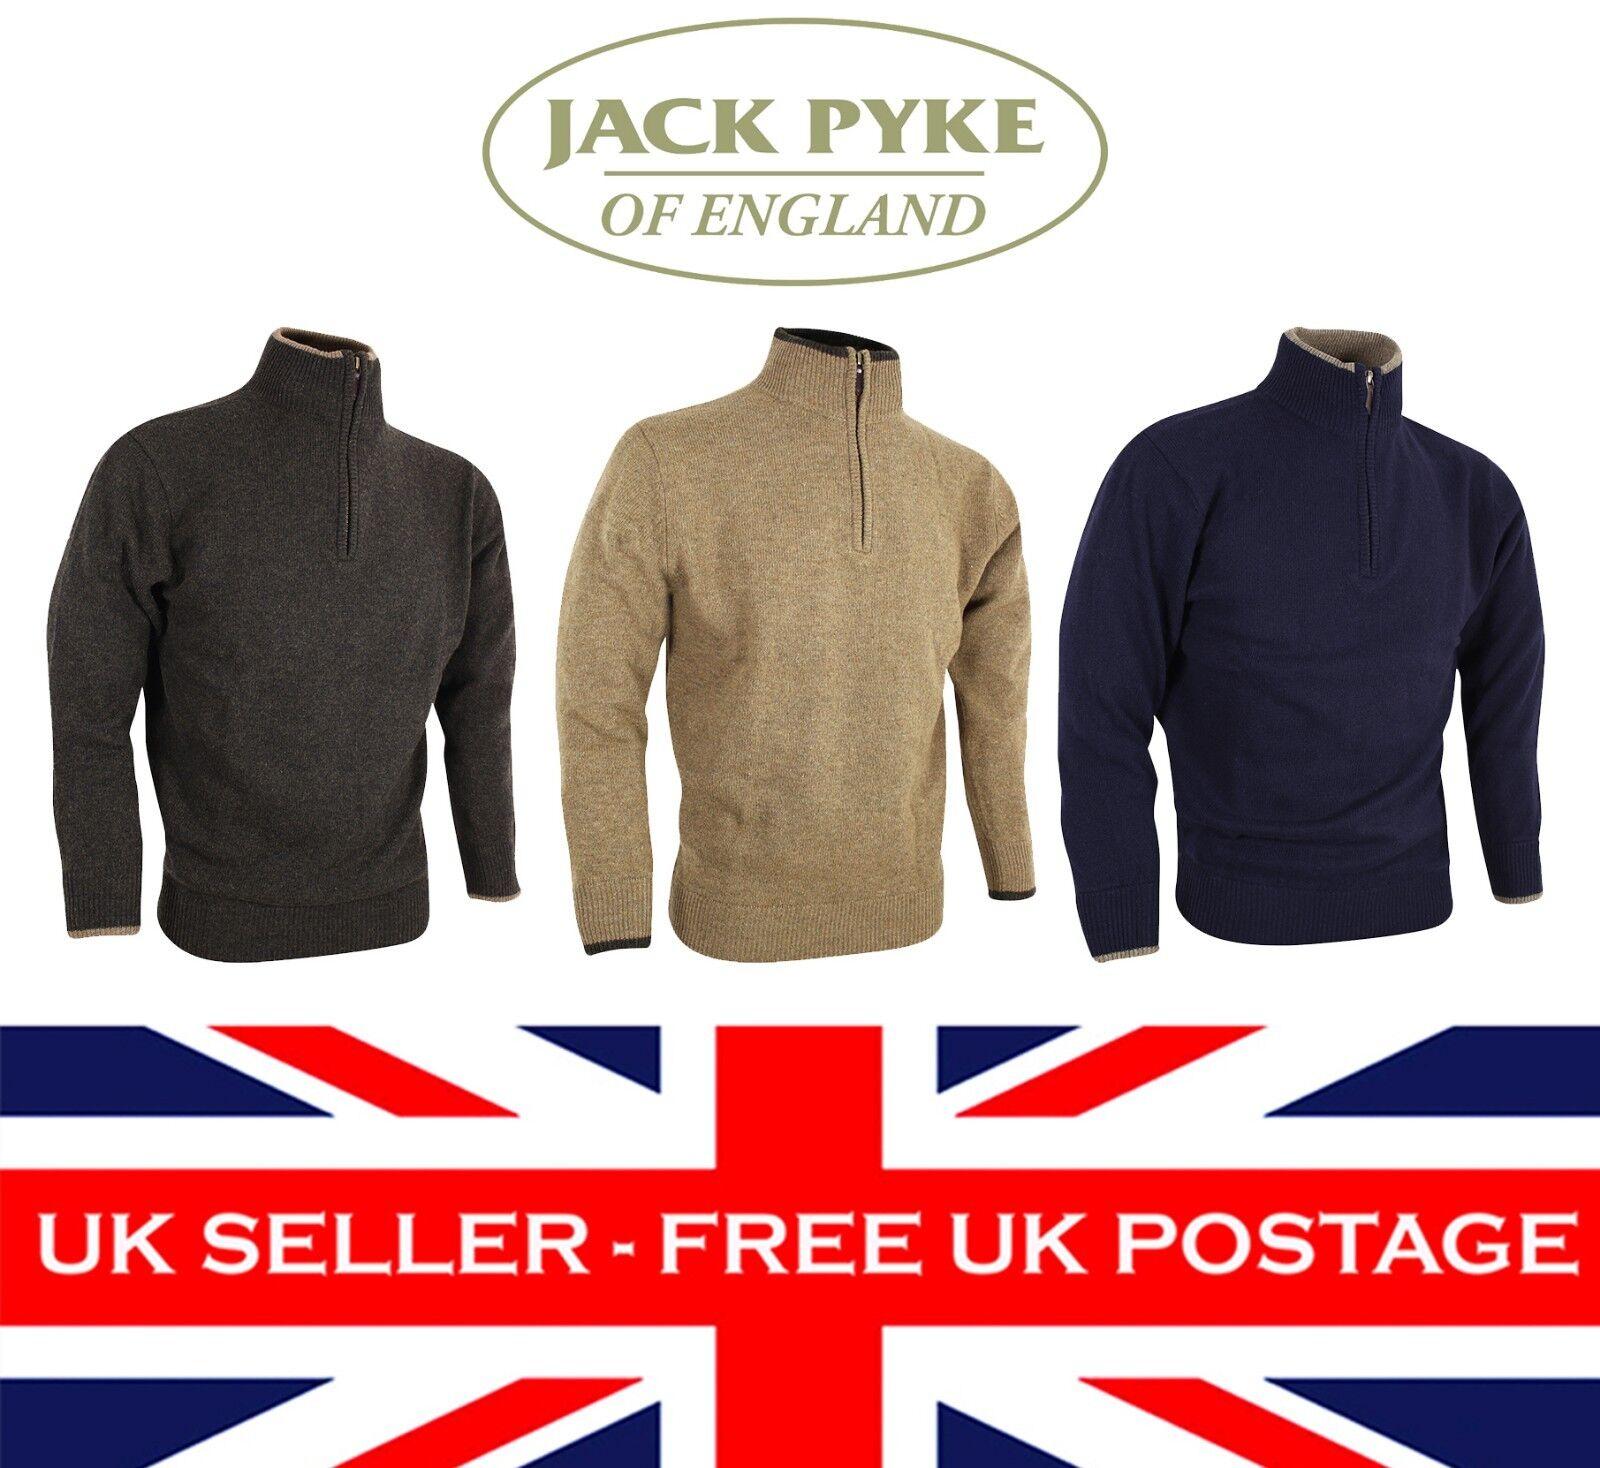 JACK Pyke ashcombe 100% Agnelli Lana Zip Knit Pullover Jumper S-3XL SHOOTING UK